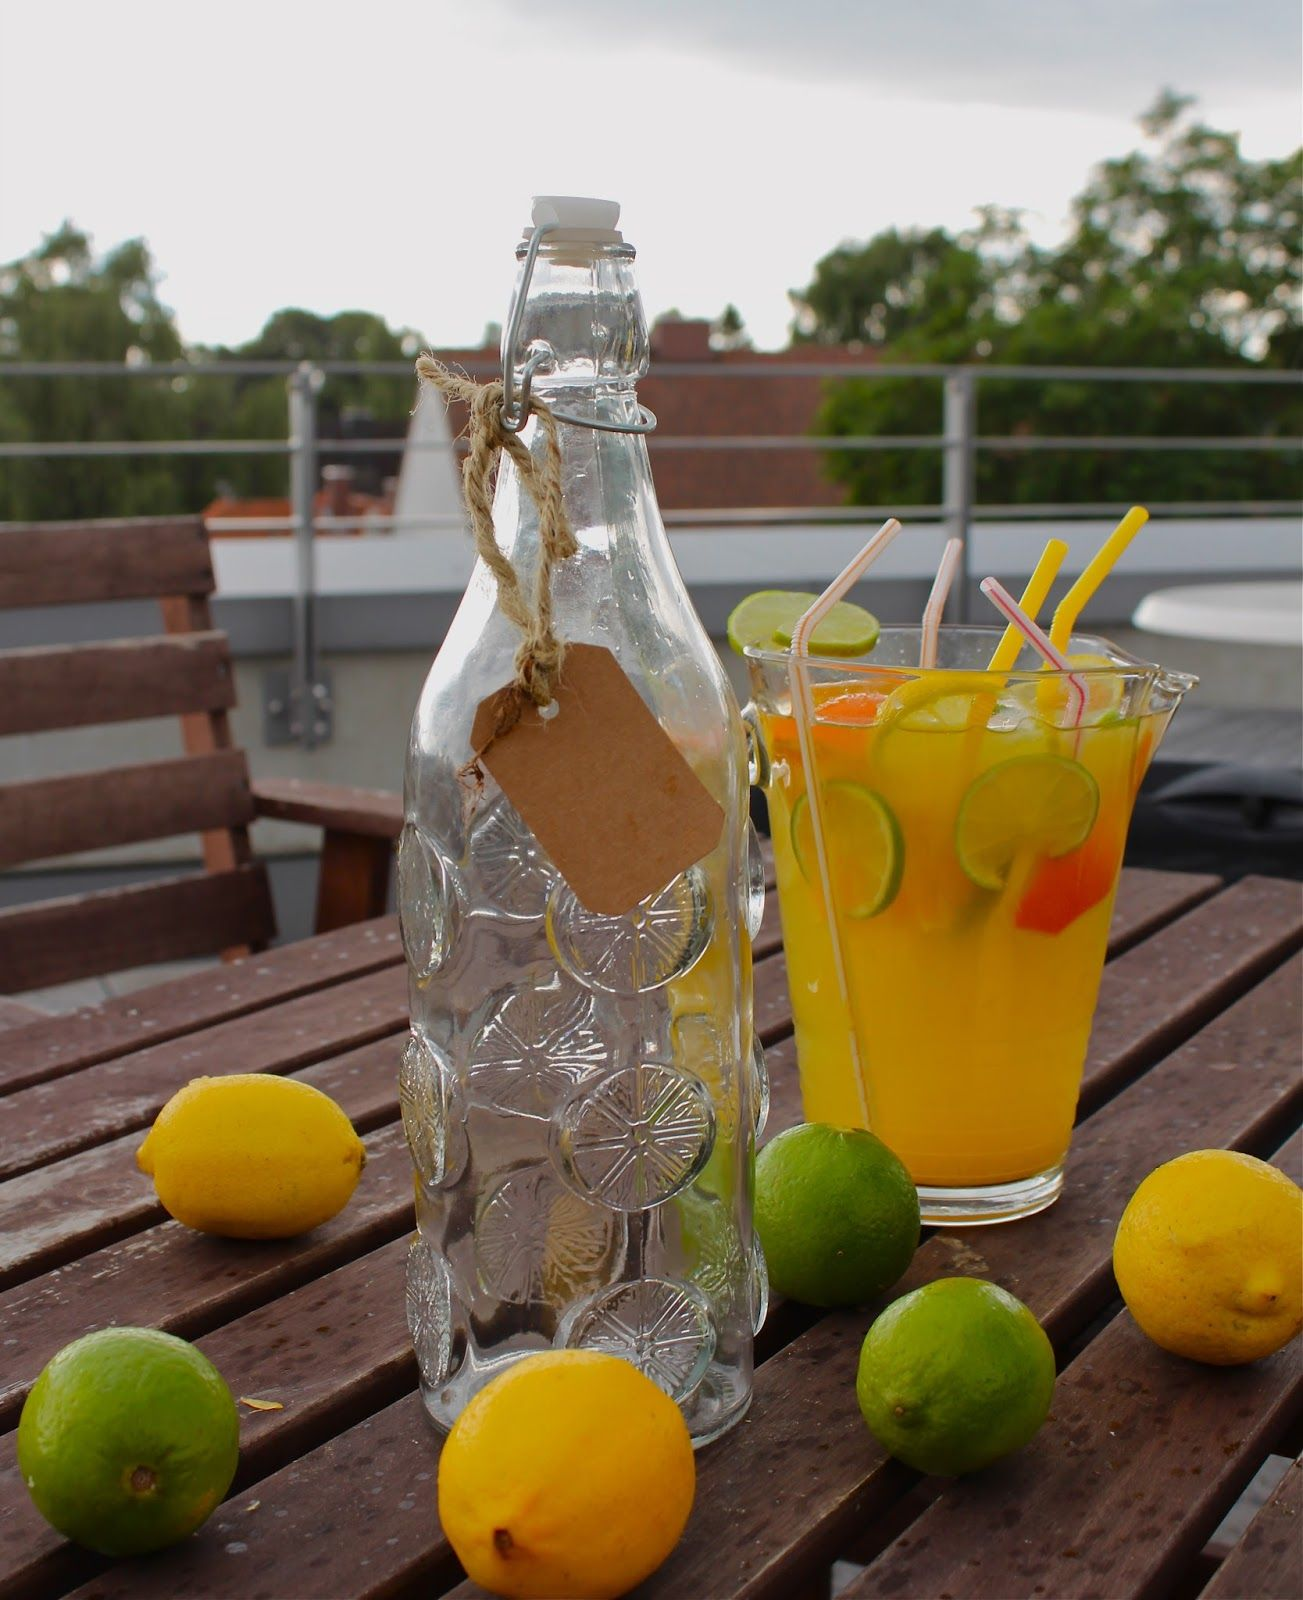 Pam´s Küchenzauber: Orangen-Zitronen-Limonade